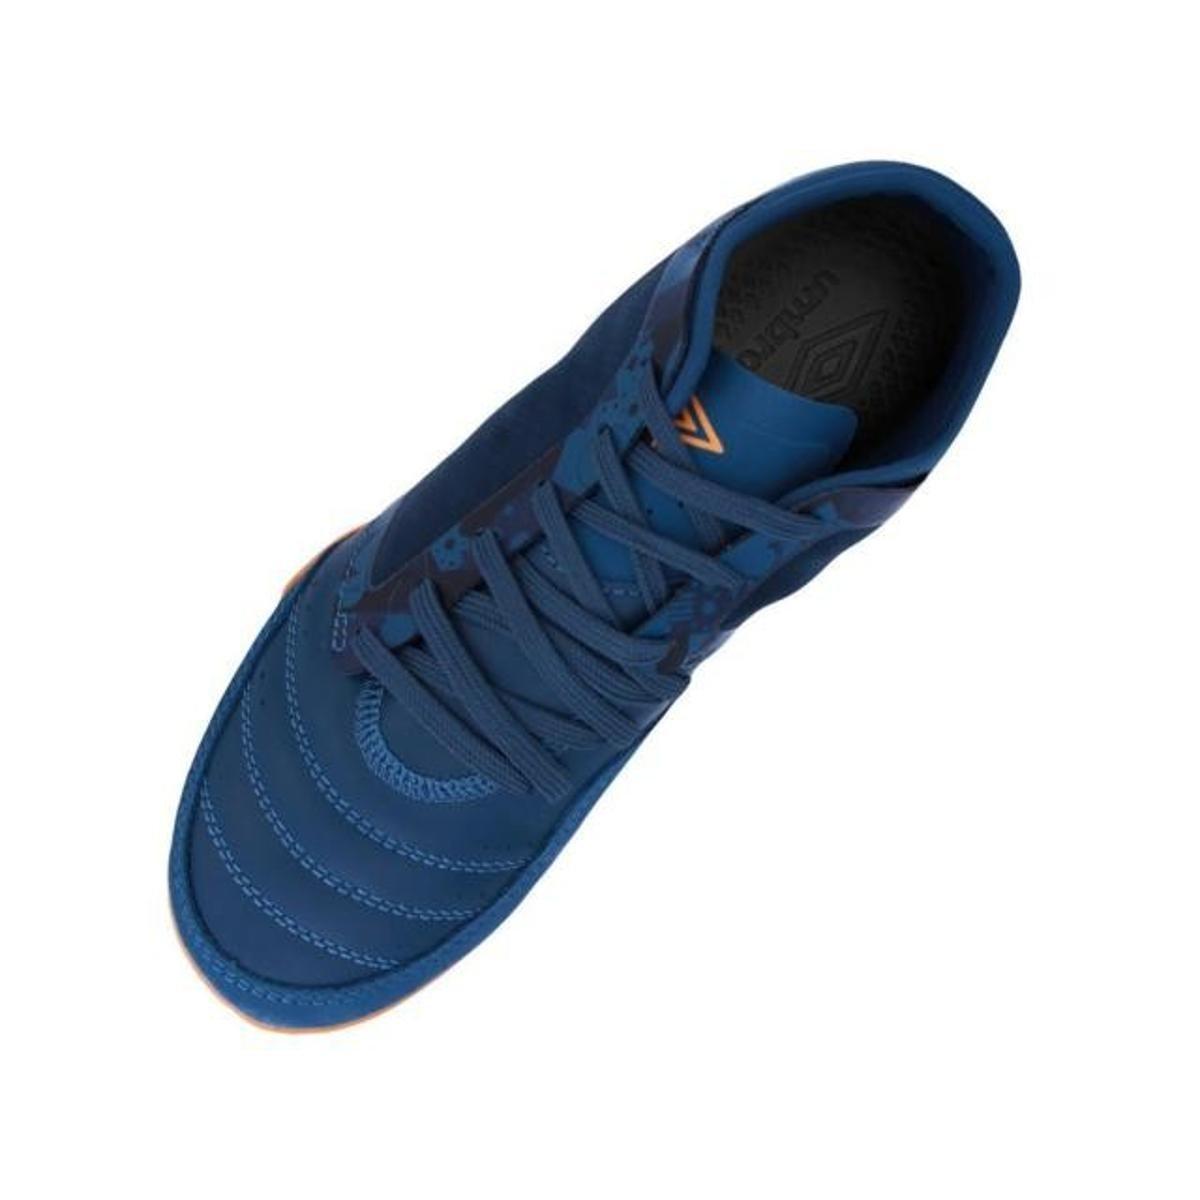 94493377b6 Chuteira Futsal Umbro Indoor Chaleira Masculina - Azul - Compre ...